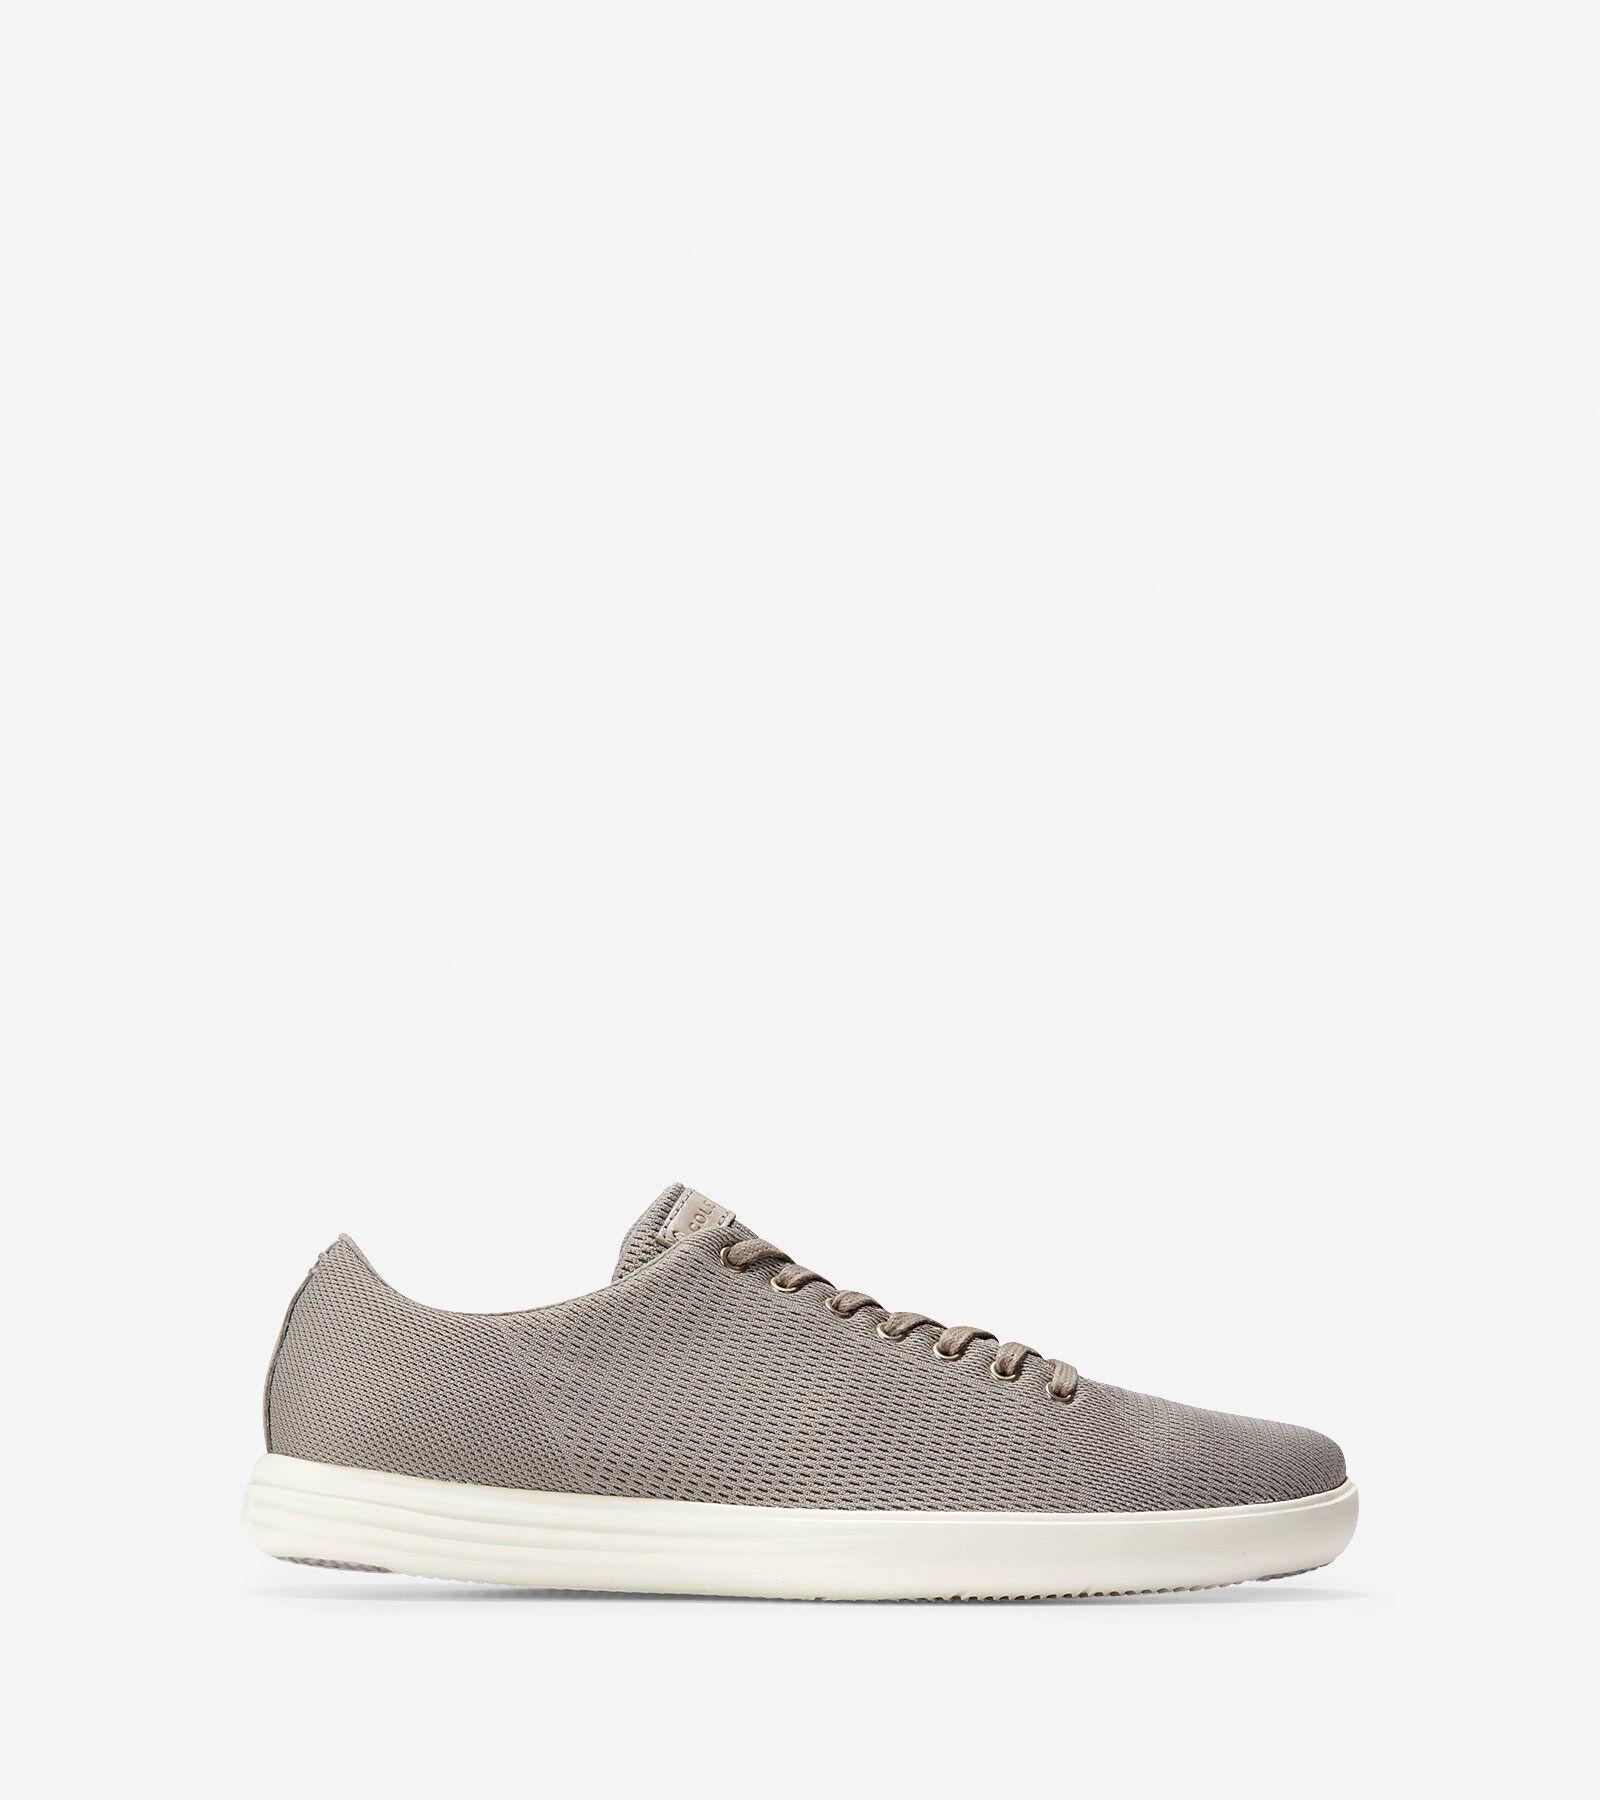 Cole Haan Grand Crosscourt Knit Sneaker 99ApuJVes